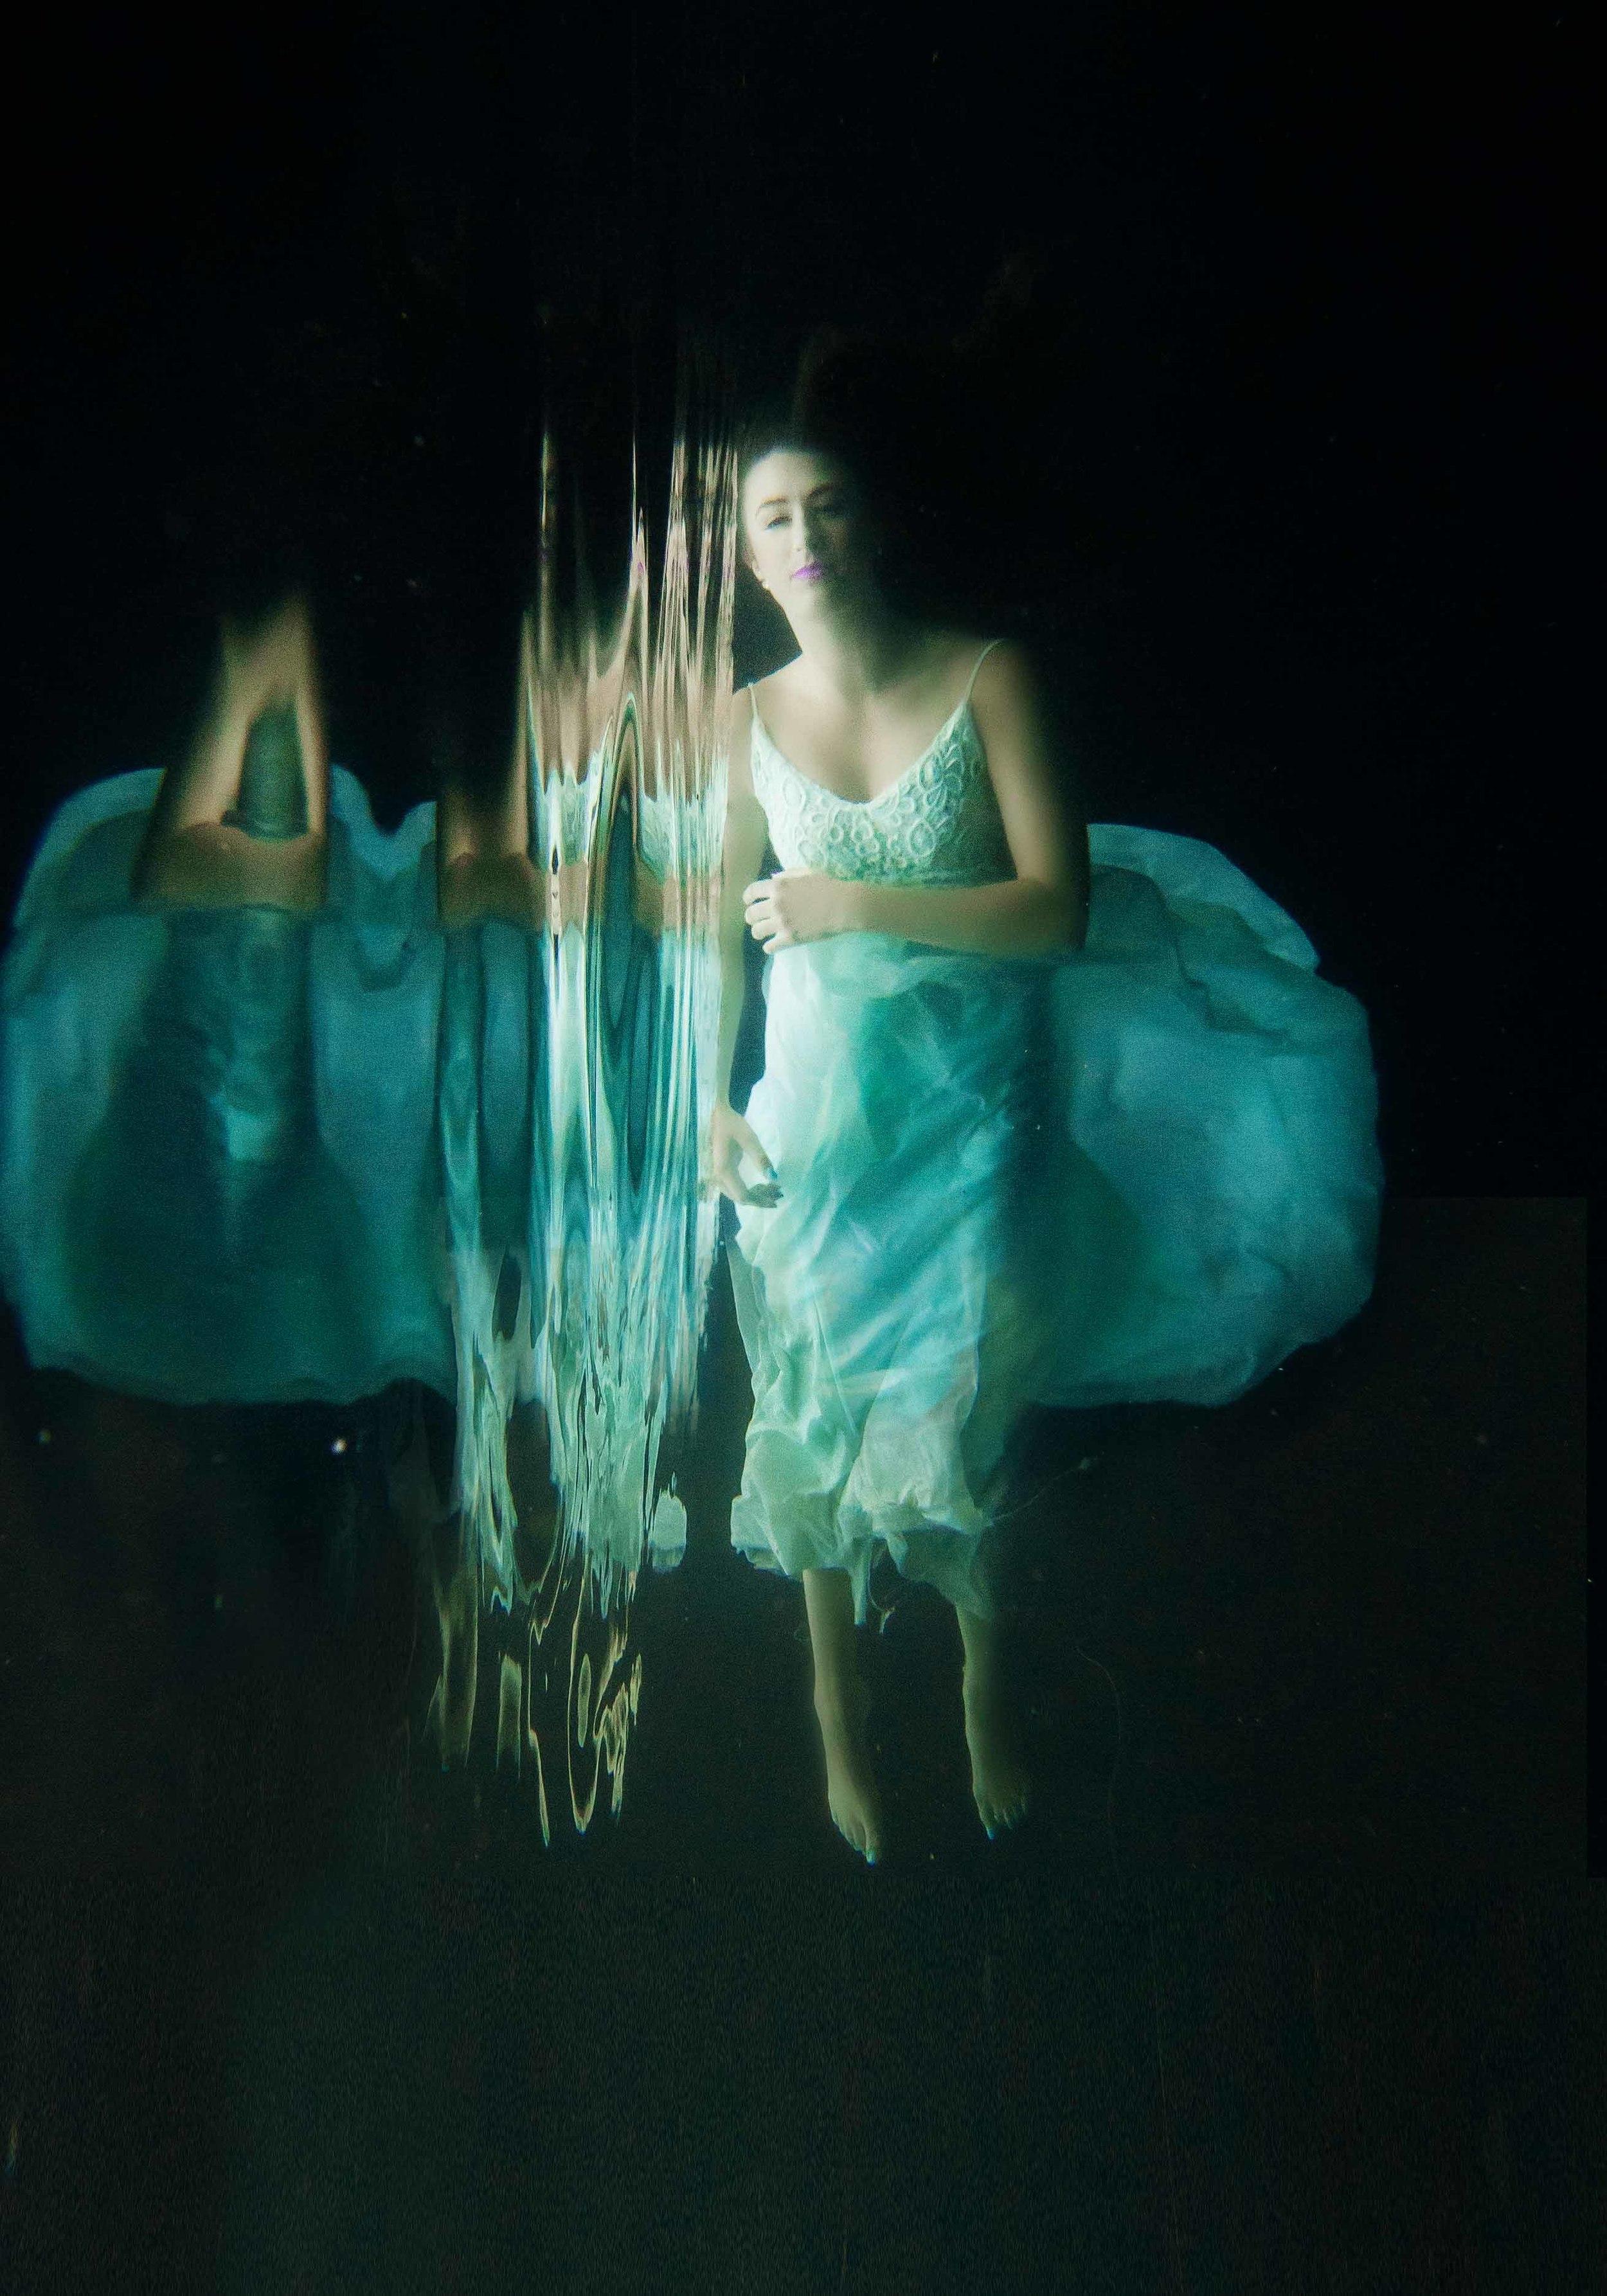 lauren_MERMAIDSESSIONS_BrienneMichelle_Photography.JPG